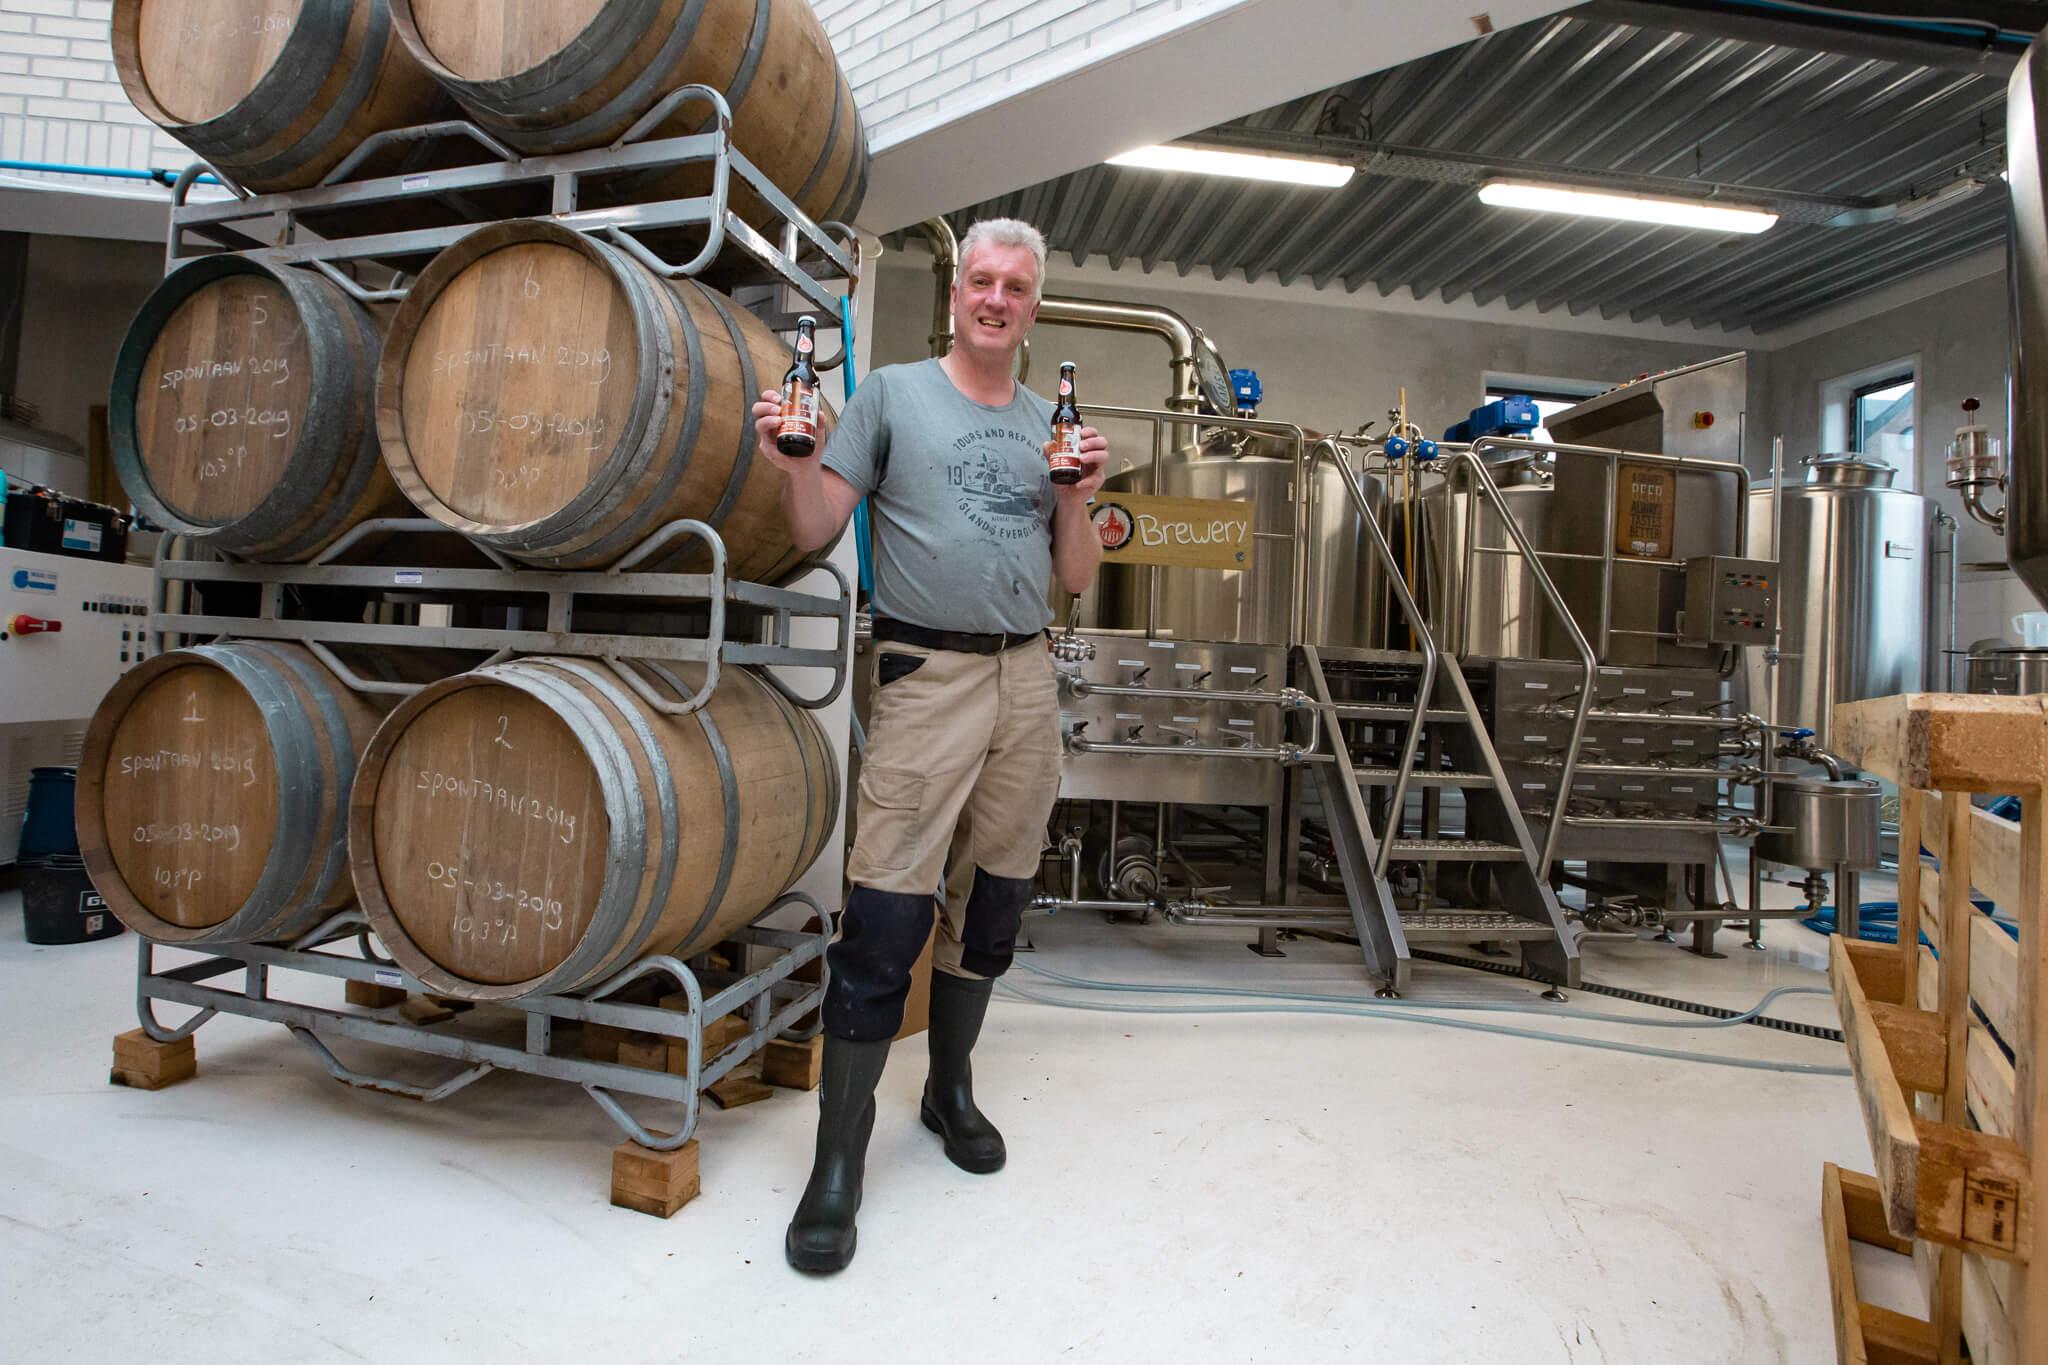 WEEK 44:  Het verhaal van Brouwerij Eanske